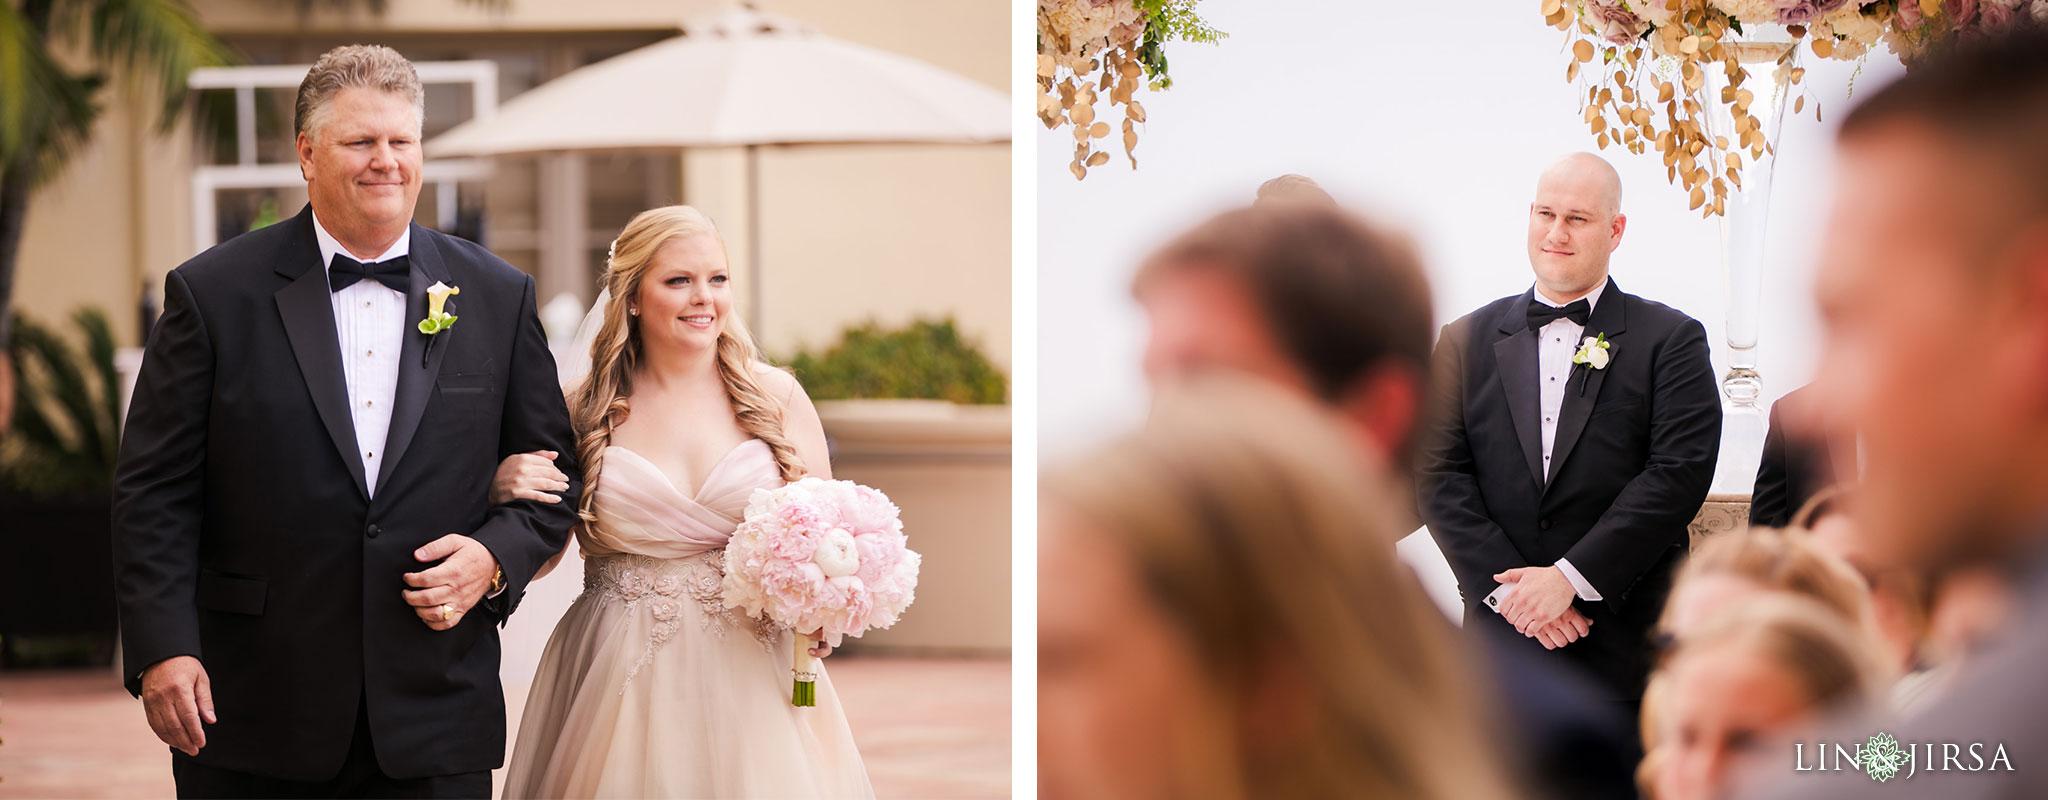 17 ritz carlton laguna niguel wedding photography